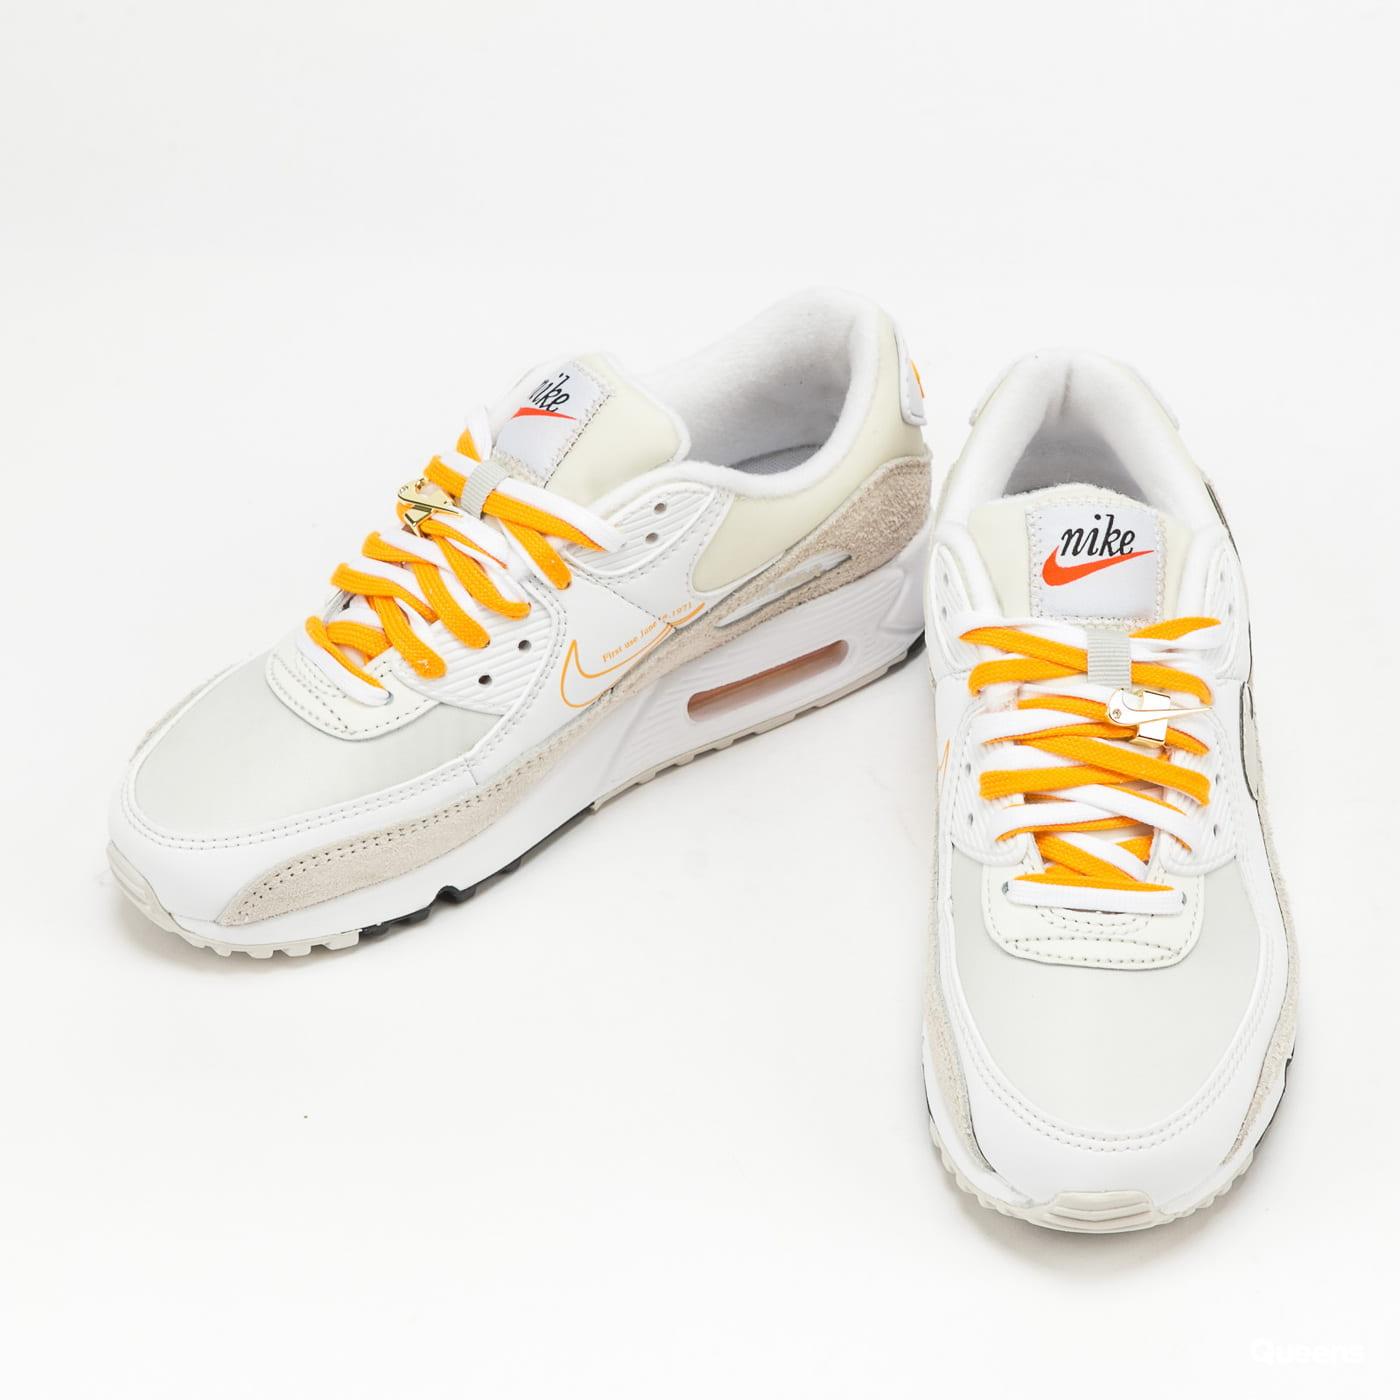 Nike W Air Max 90 SE white / light bone